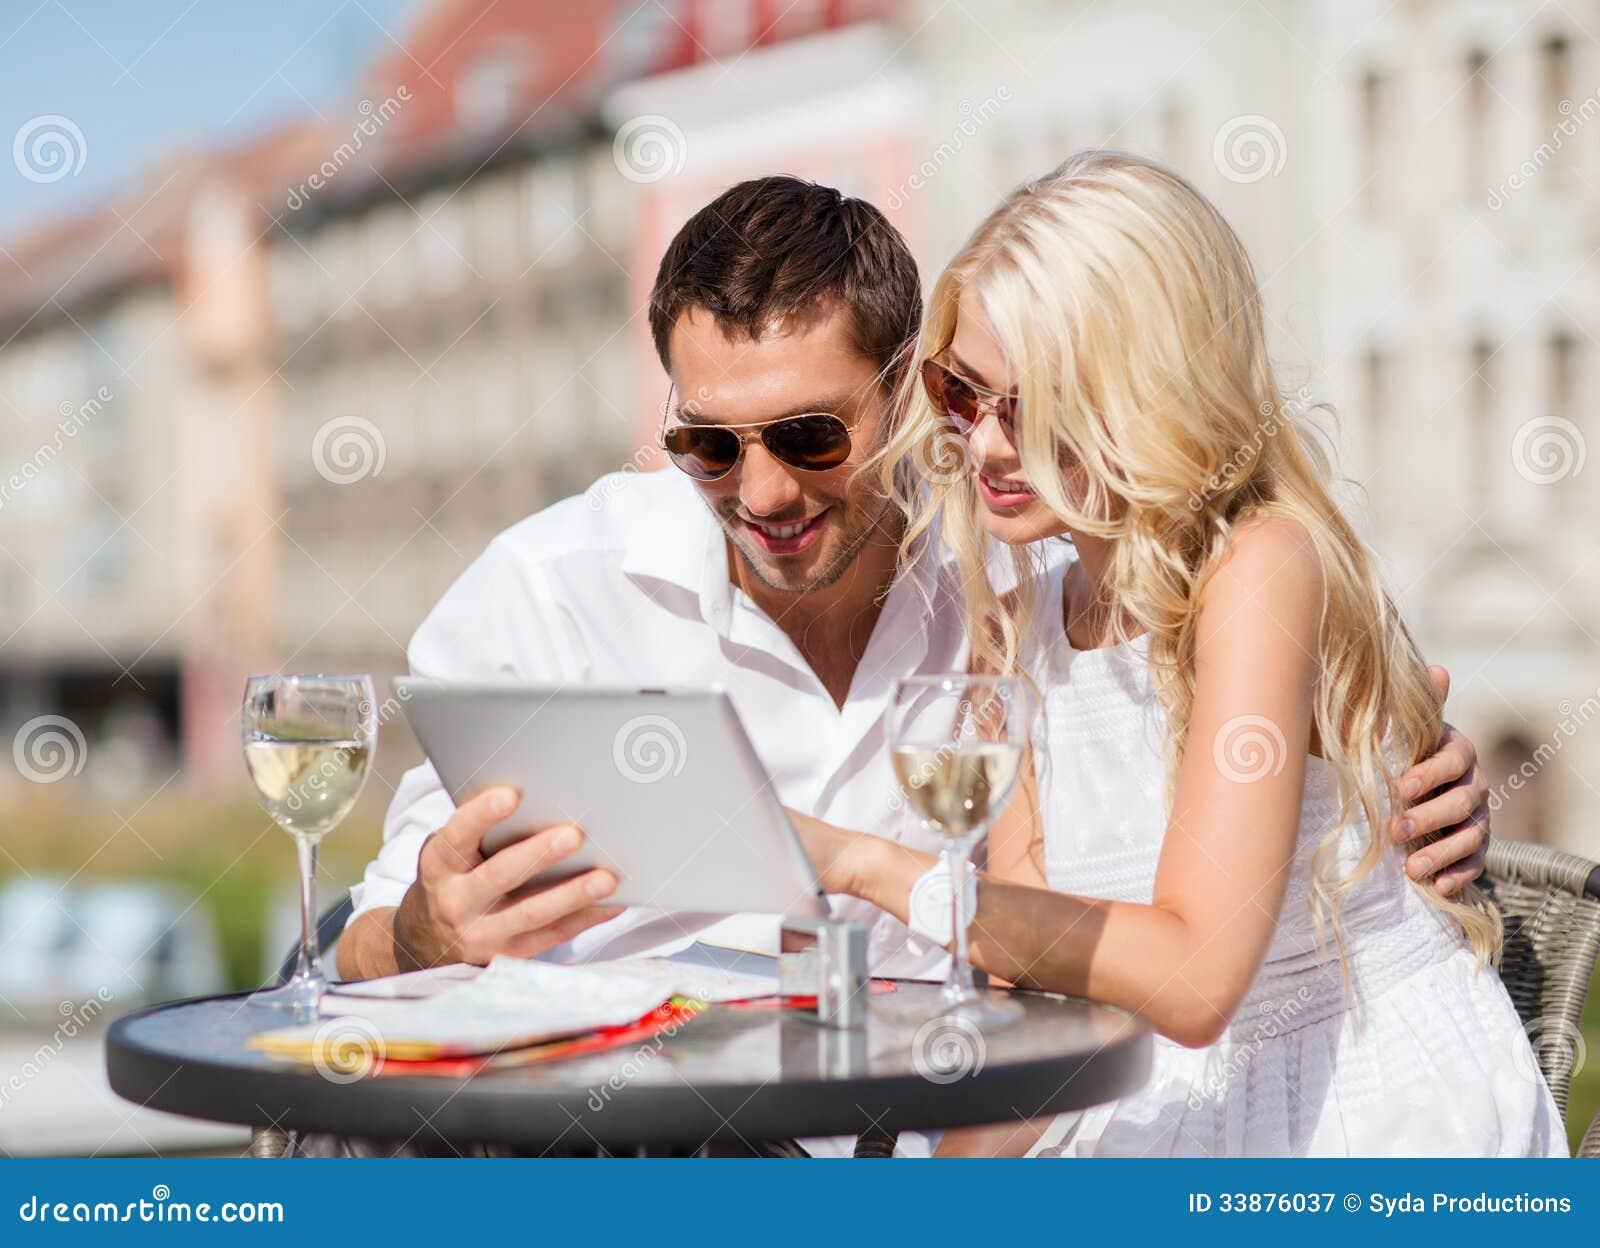 munich dating